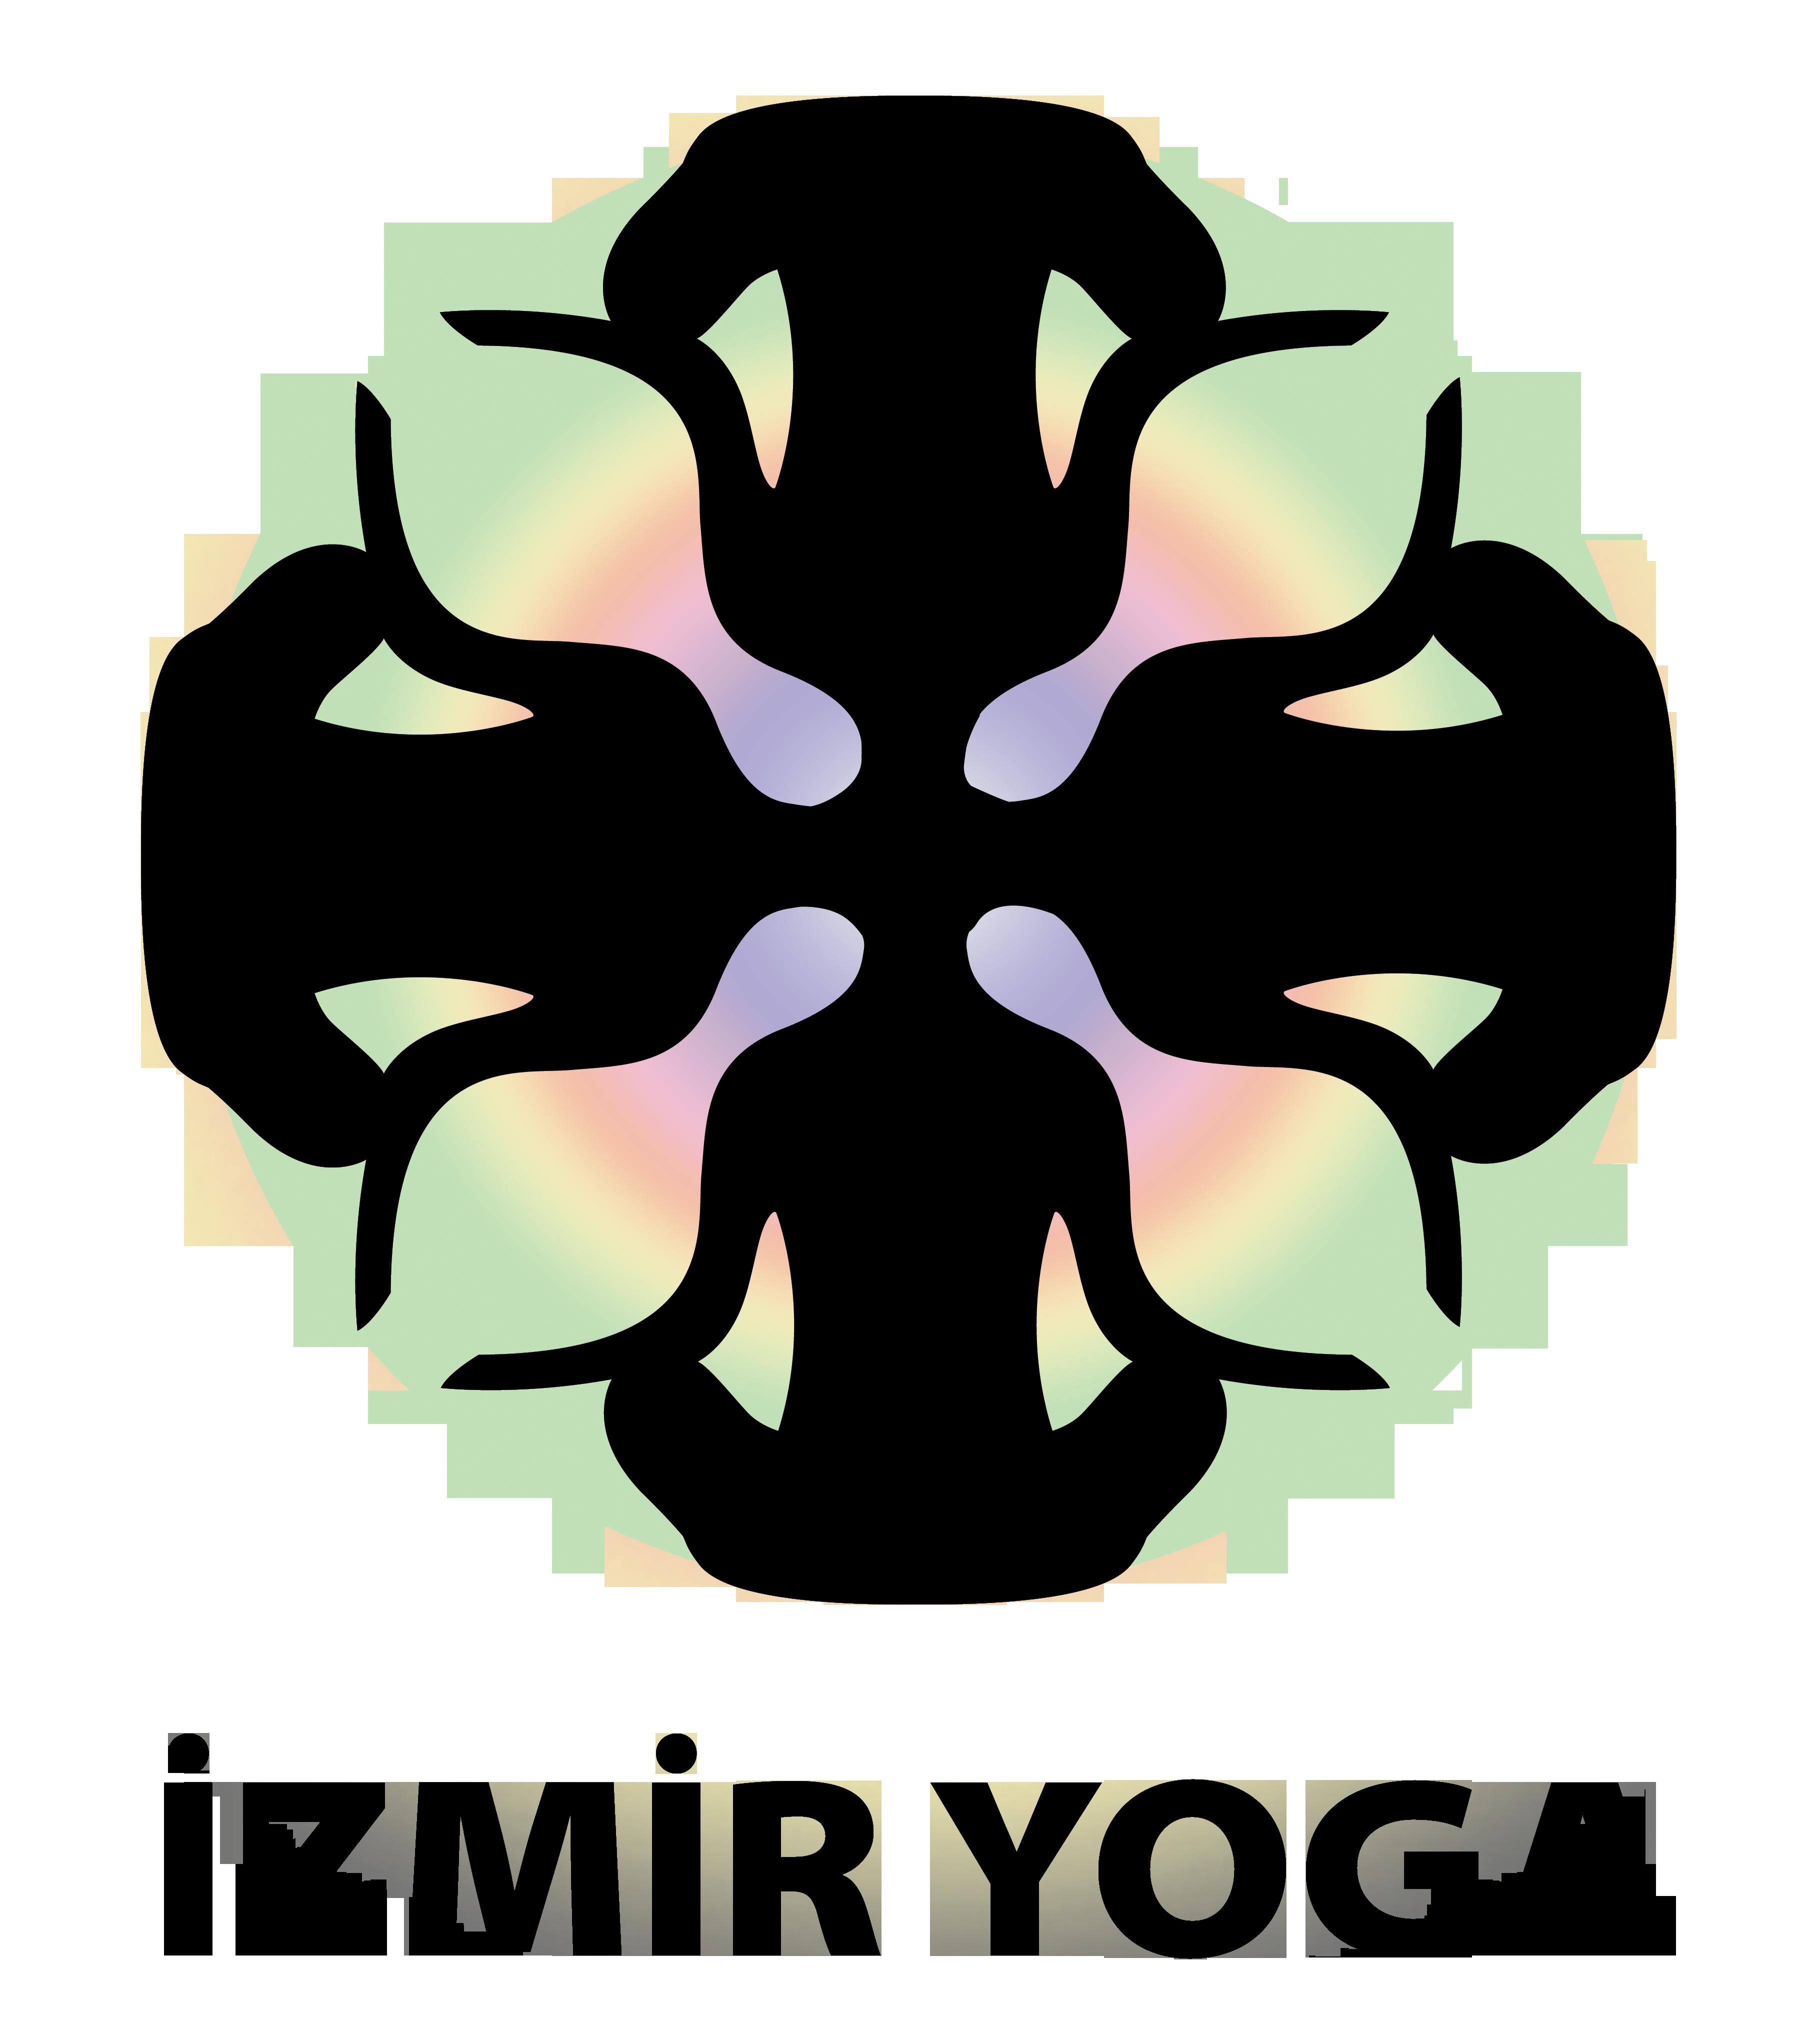 izmir_yoga_logo